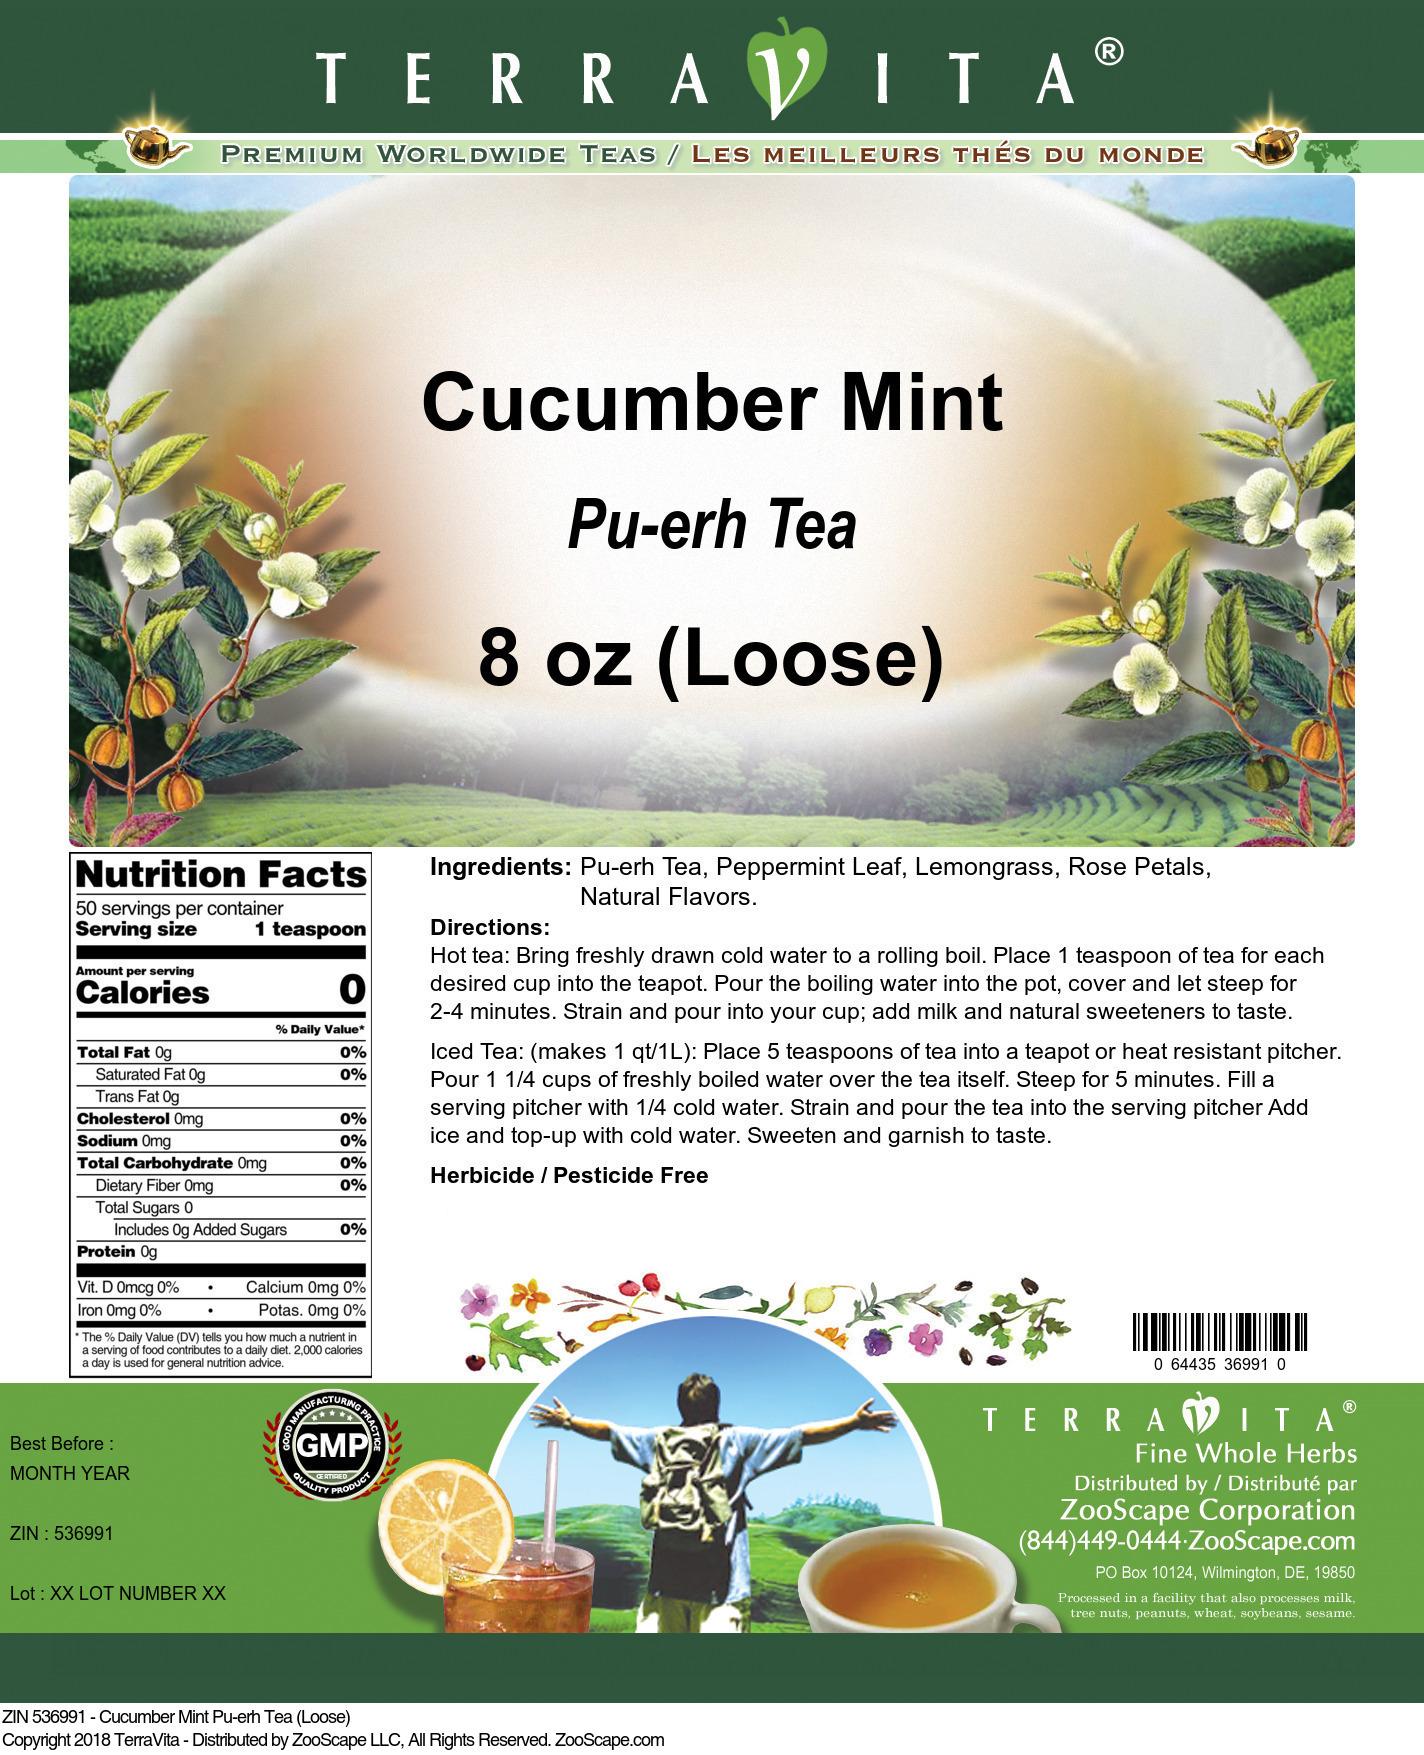 Cucumber Mint Pu-erh Tea (Loose)